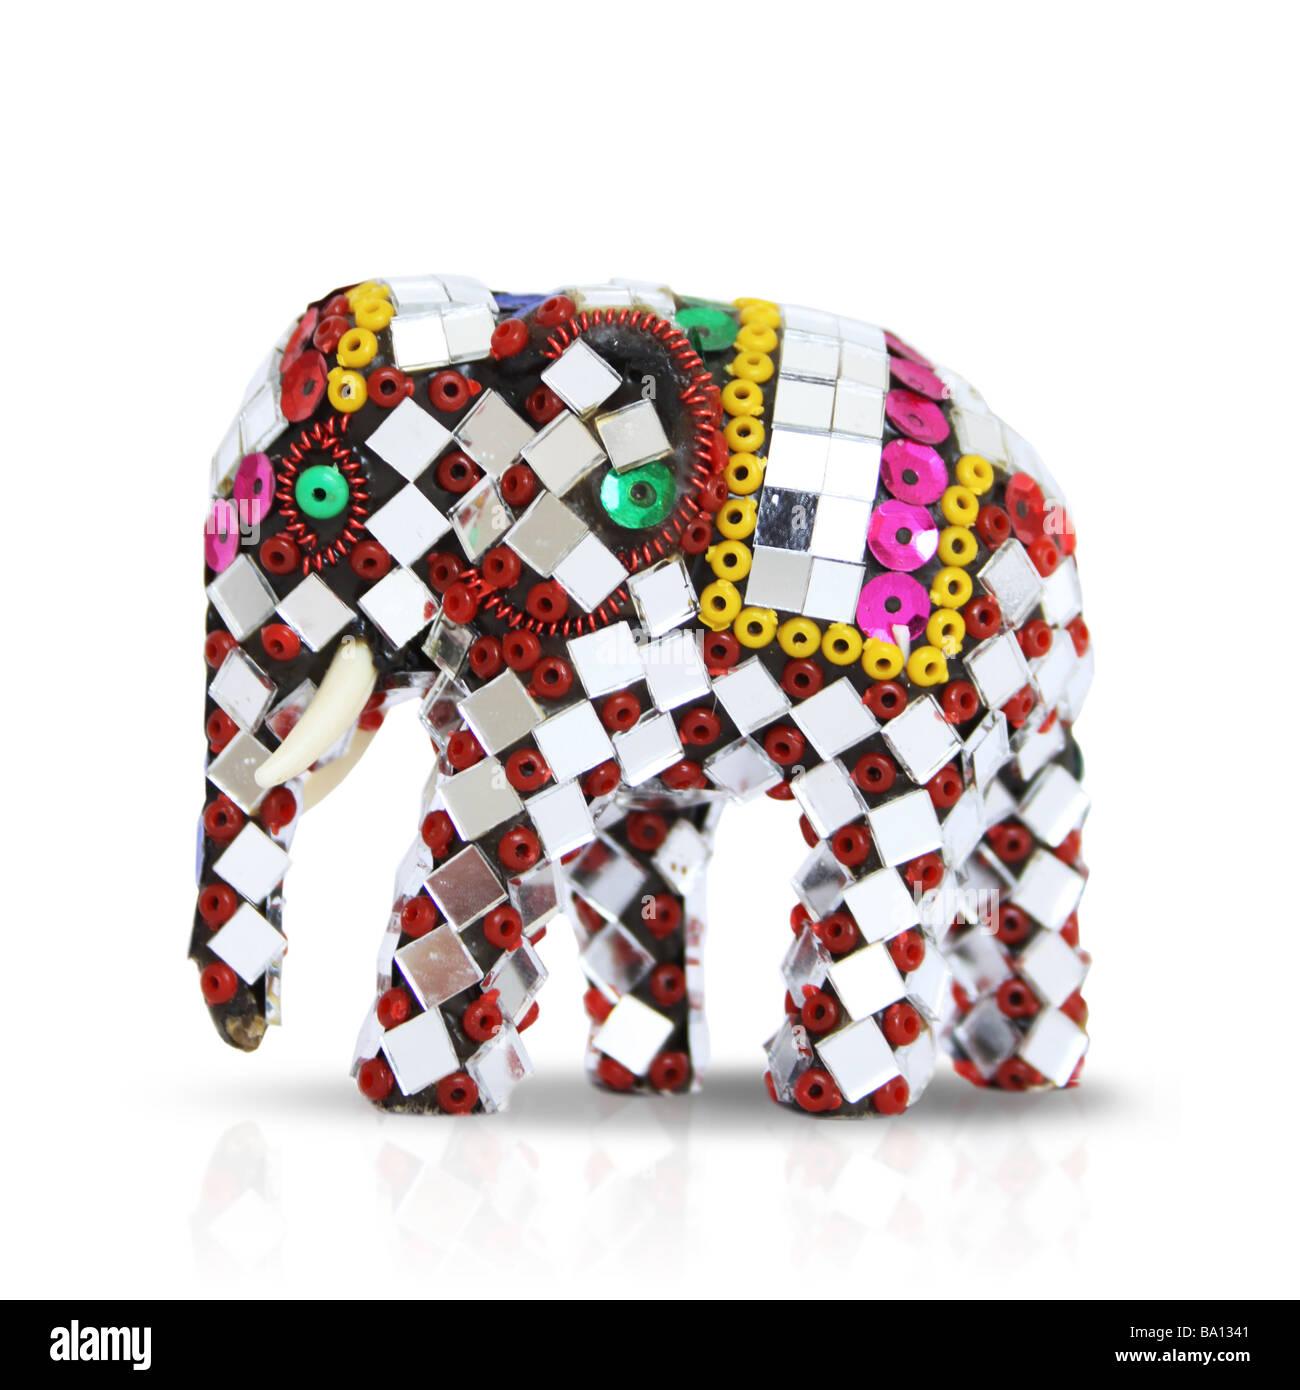 Decorated ornate Thai elephant figure - Stock Image